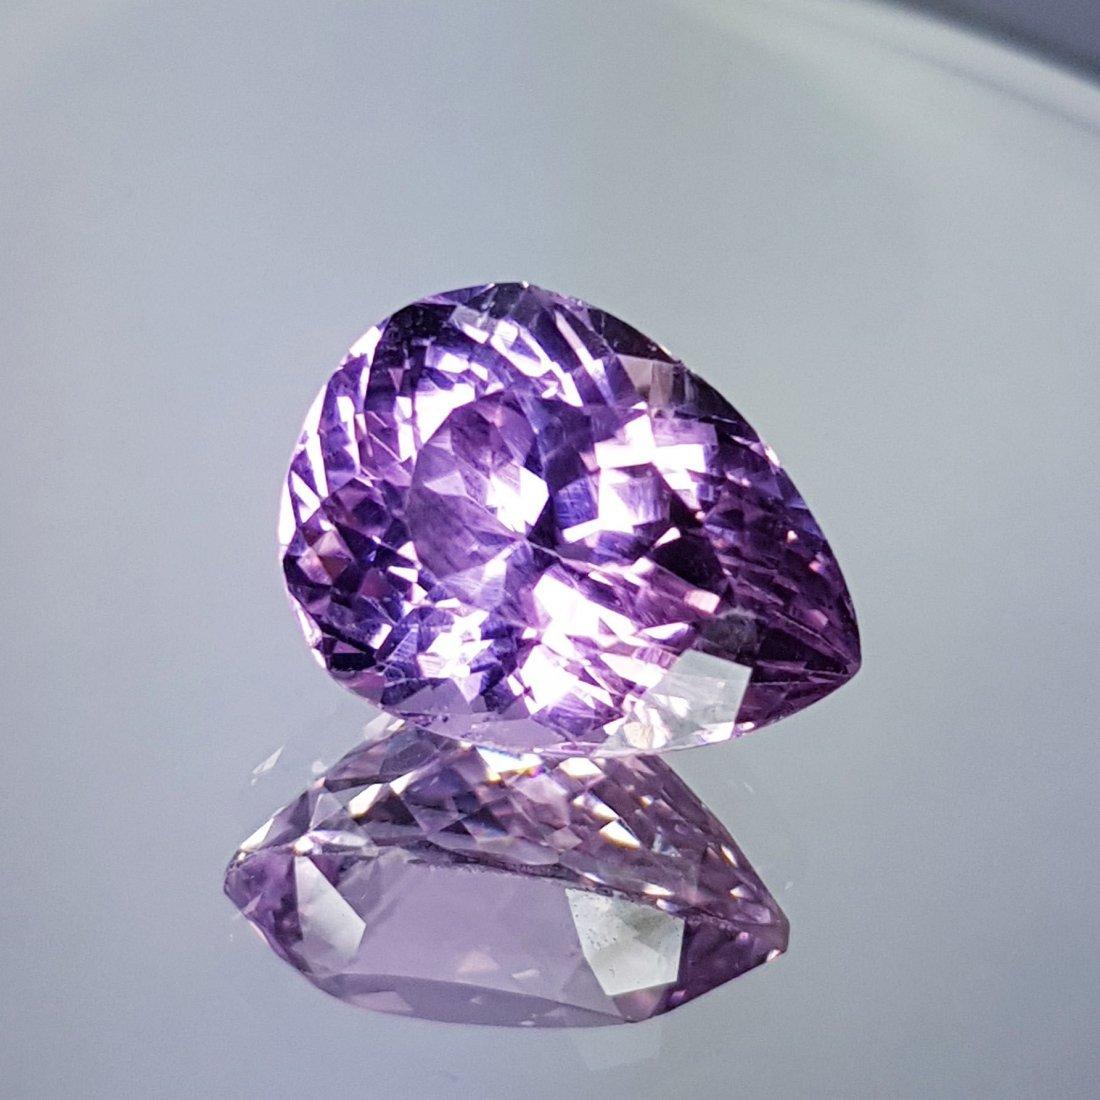 Pink Kunzite - 11.65 ct - 2